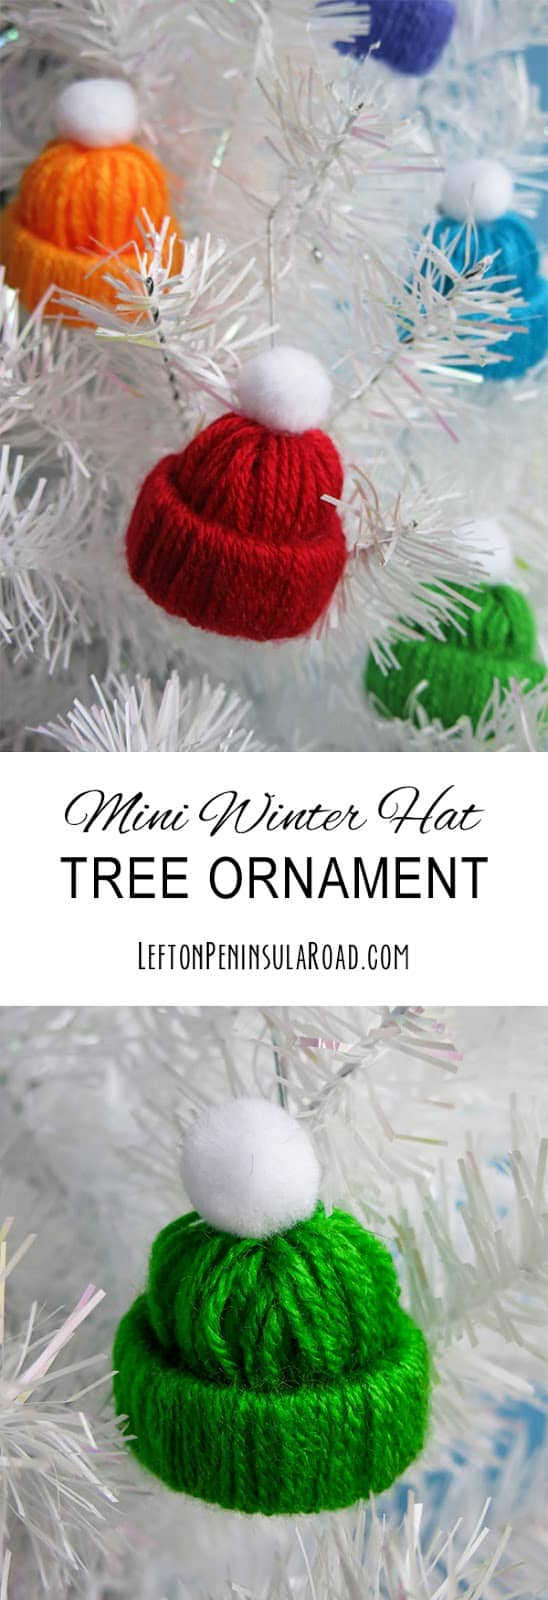 mini-winter-hat-yarn-craft-_collage_leftonpeninsularoad